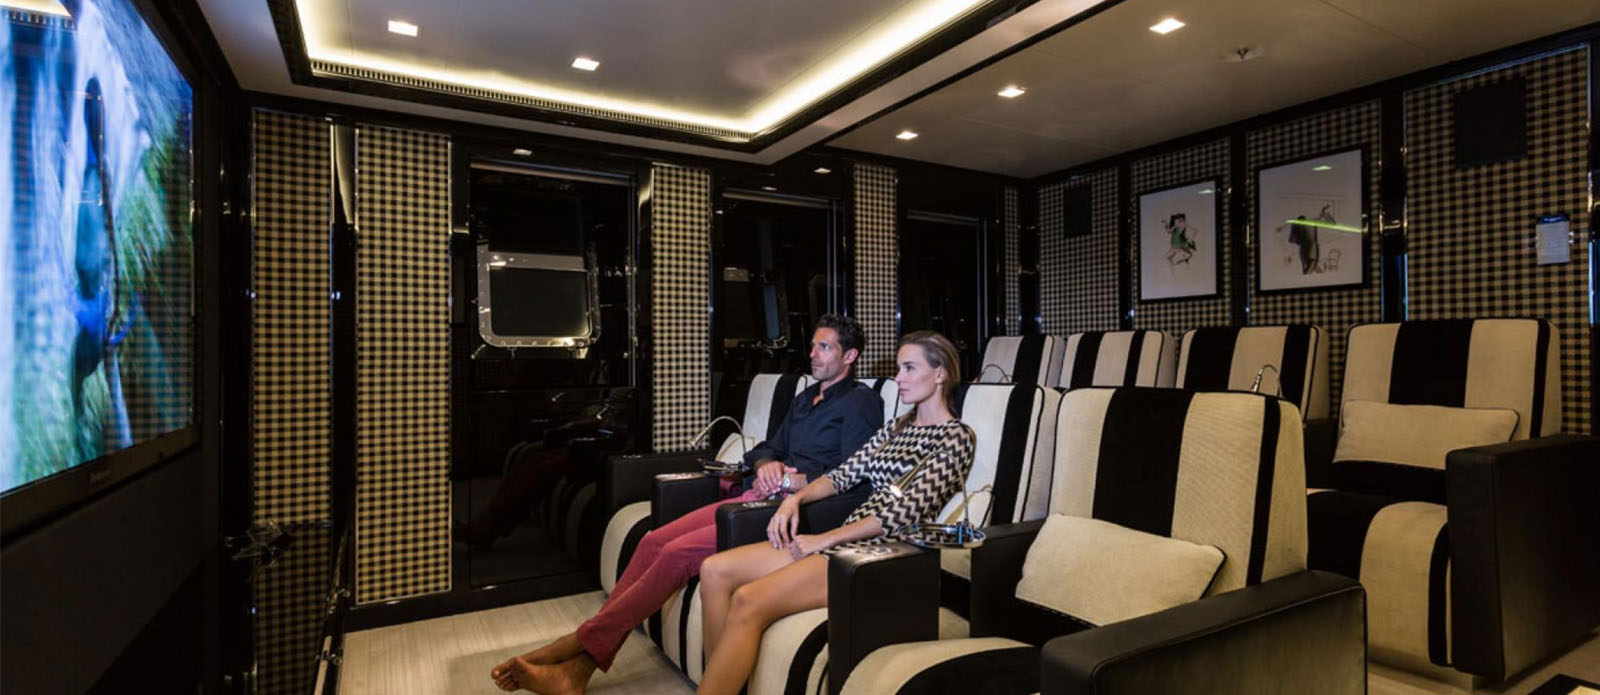 Axioma - Cinema Room